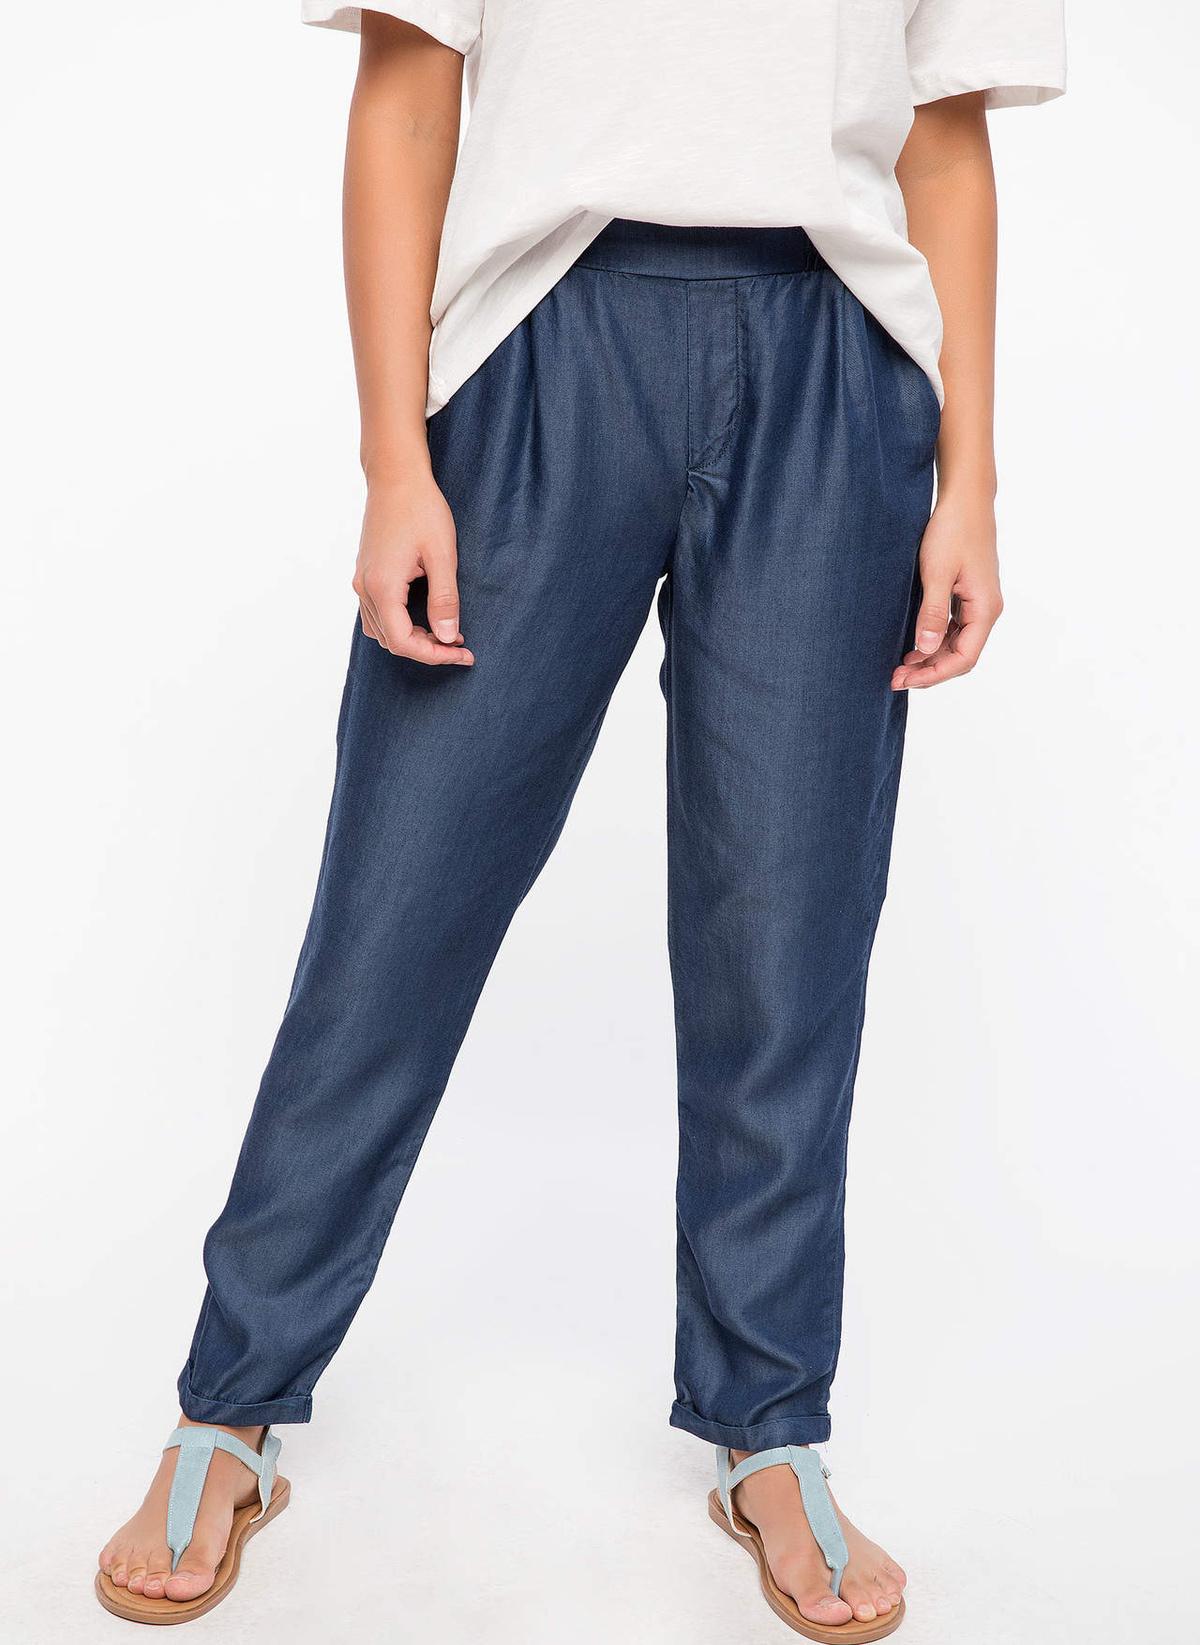 Defacto Lastik Bel Detaylı Denim Pantolon J5996az18hsbe480jean Pantolon – 69.99 TL